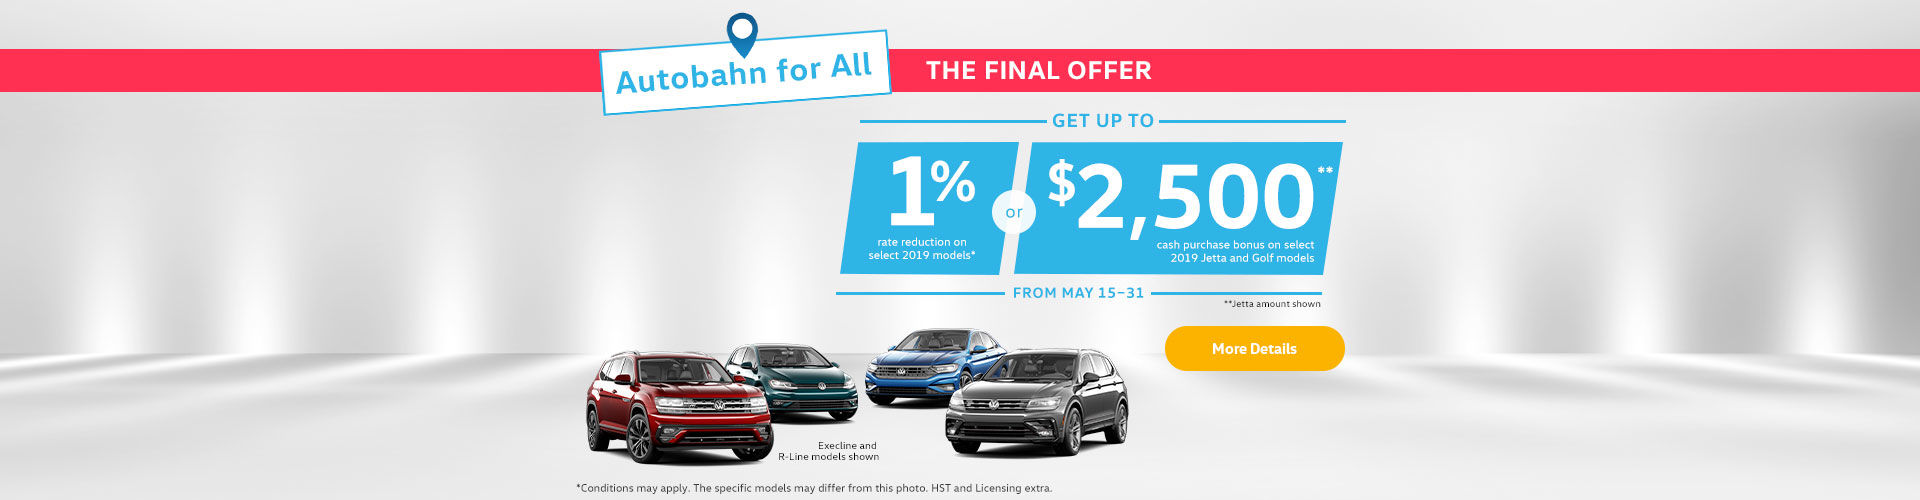 Volkswagen Autobahn Sales Event -  short sale